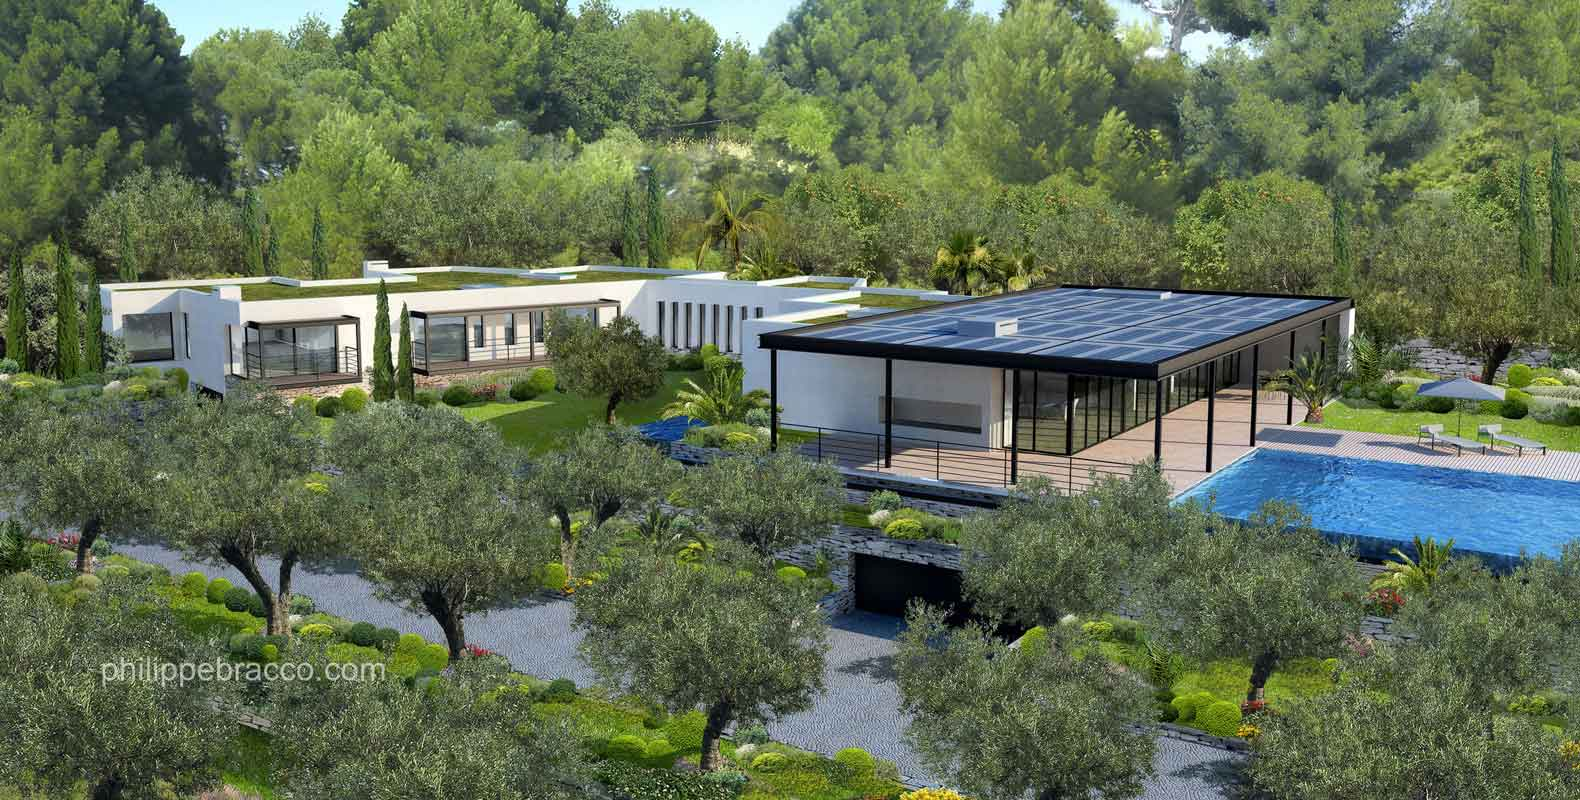 cabinet d 39 architecte cannes antibes villa lo. Black Bedroom Furniture Sets. Home Design Ideas